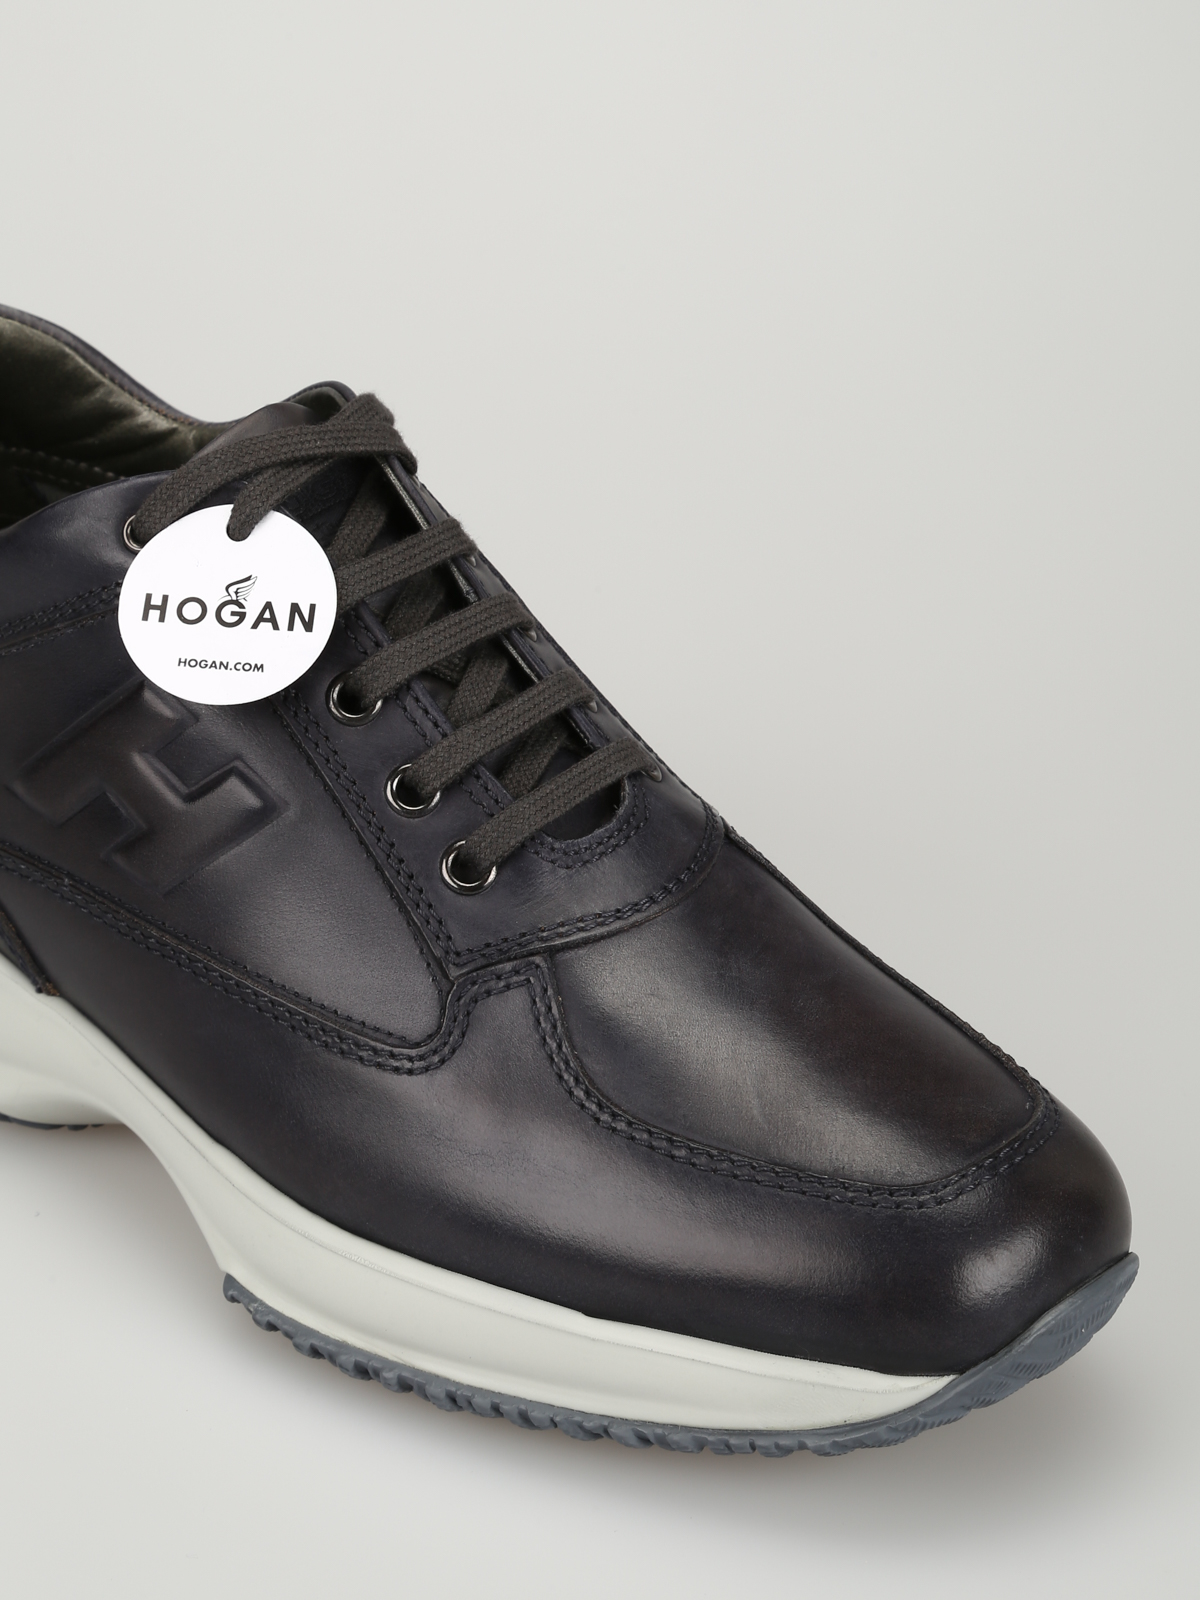 hogan black interactive